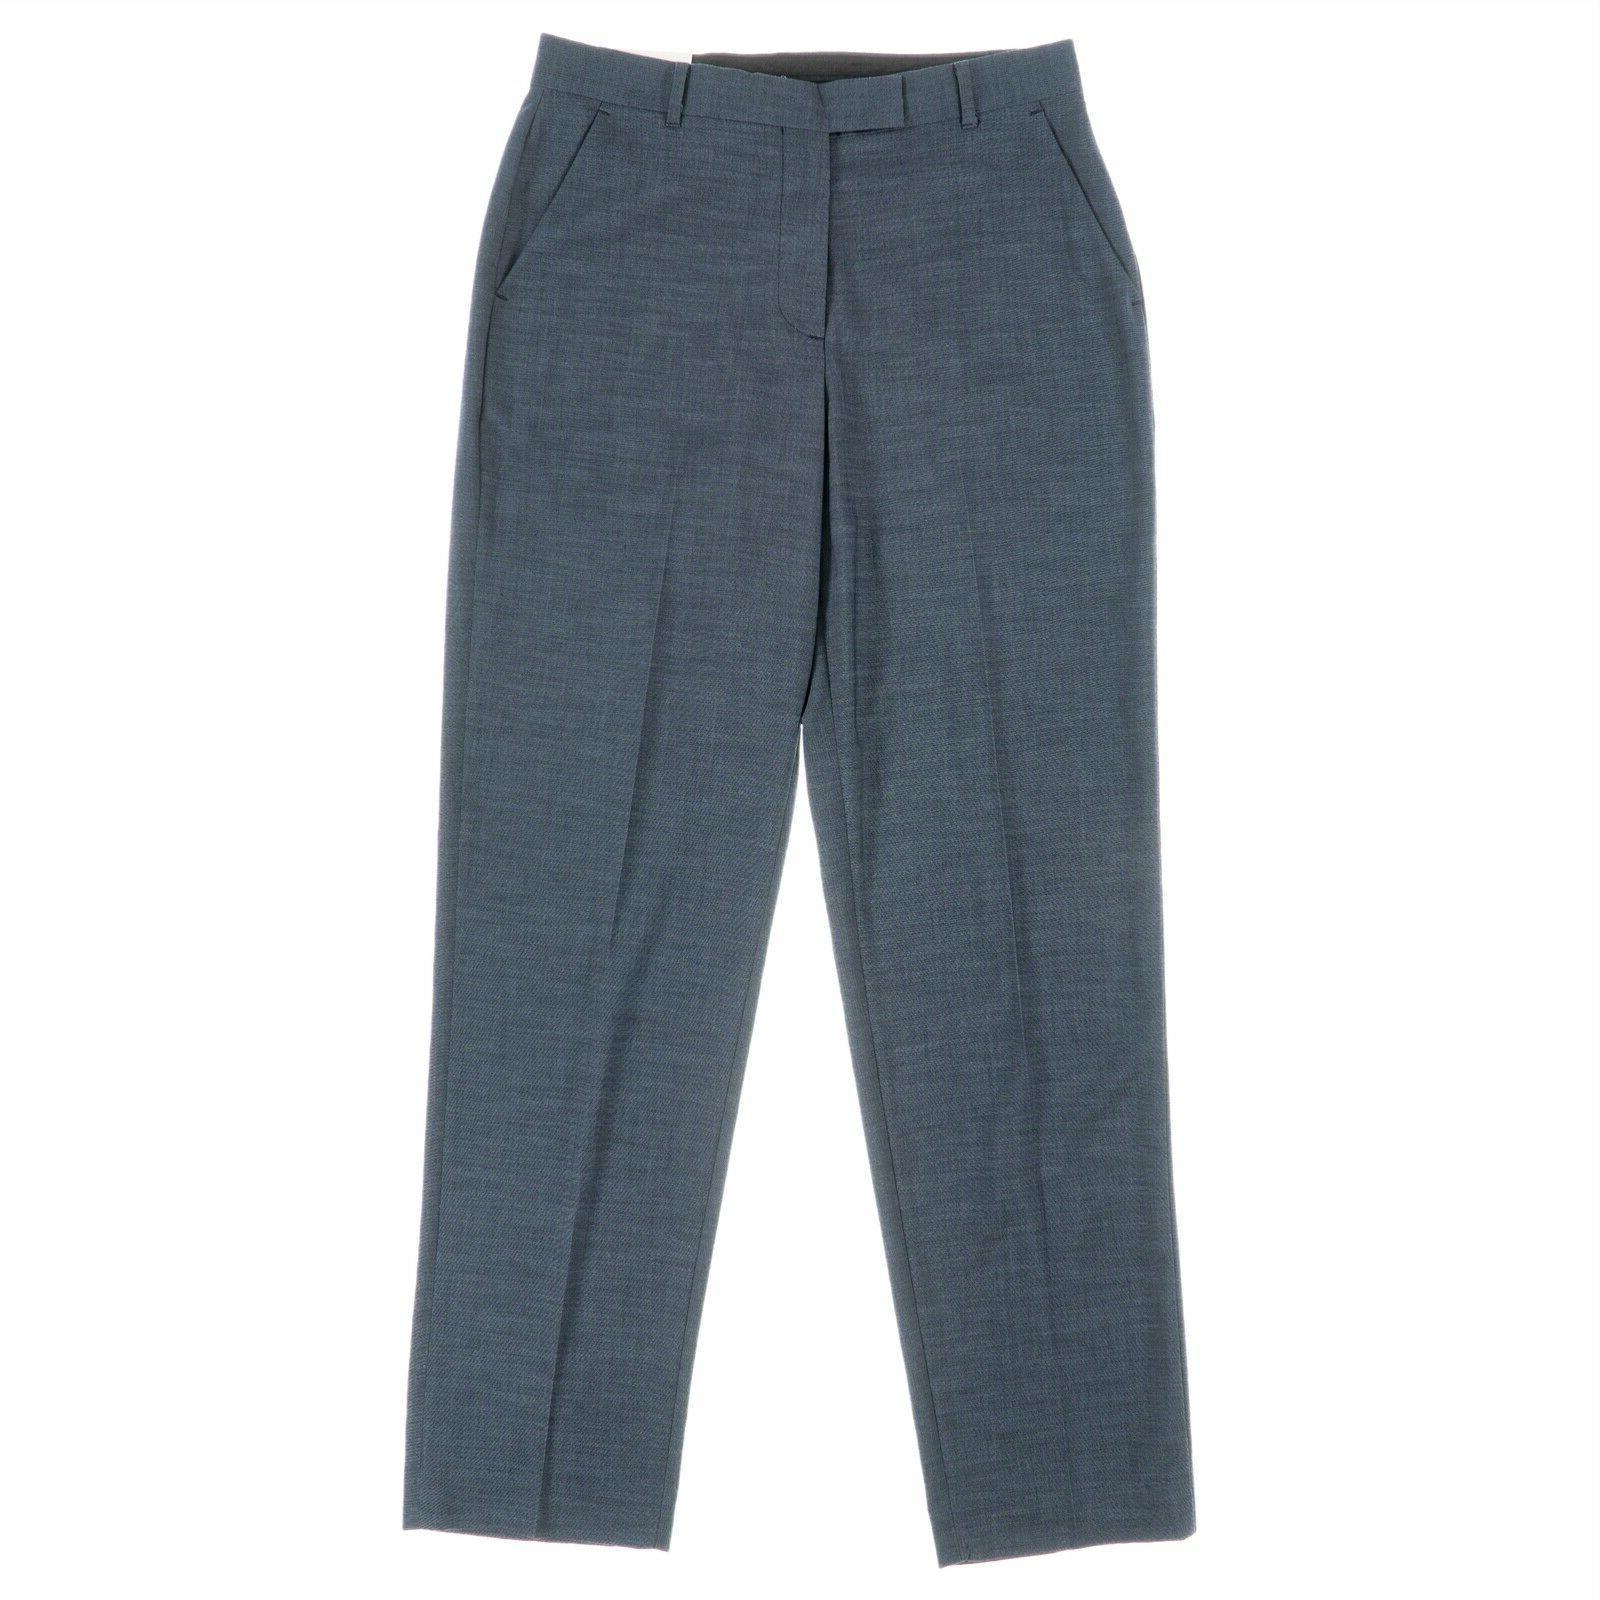 Calvin 18 Weave Stretch Pants $42.50